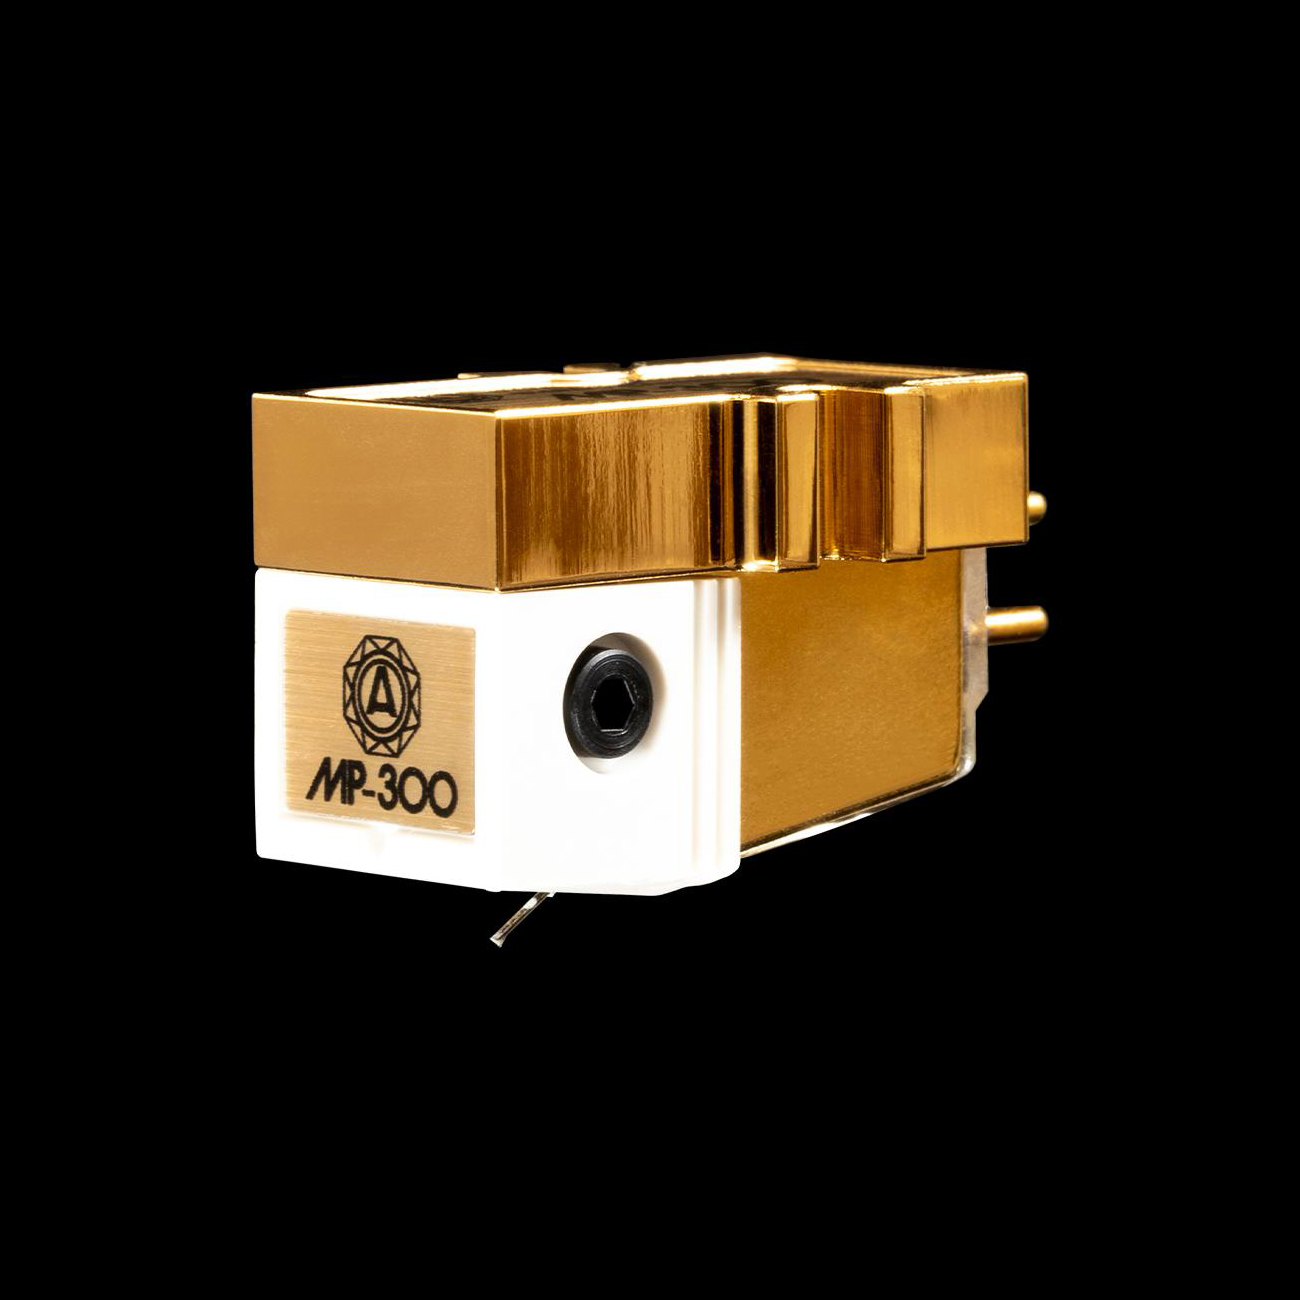 Nagaoka MP-300 Moving Permalloy Stereo Phono Cartridge